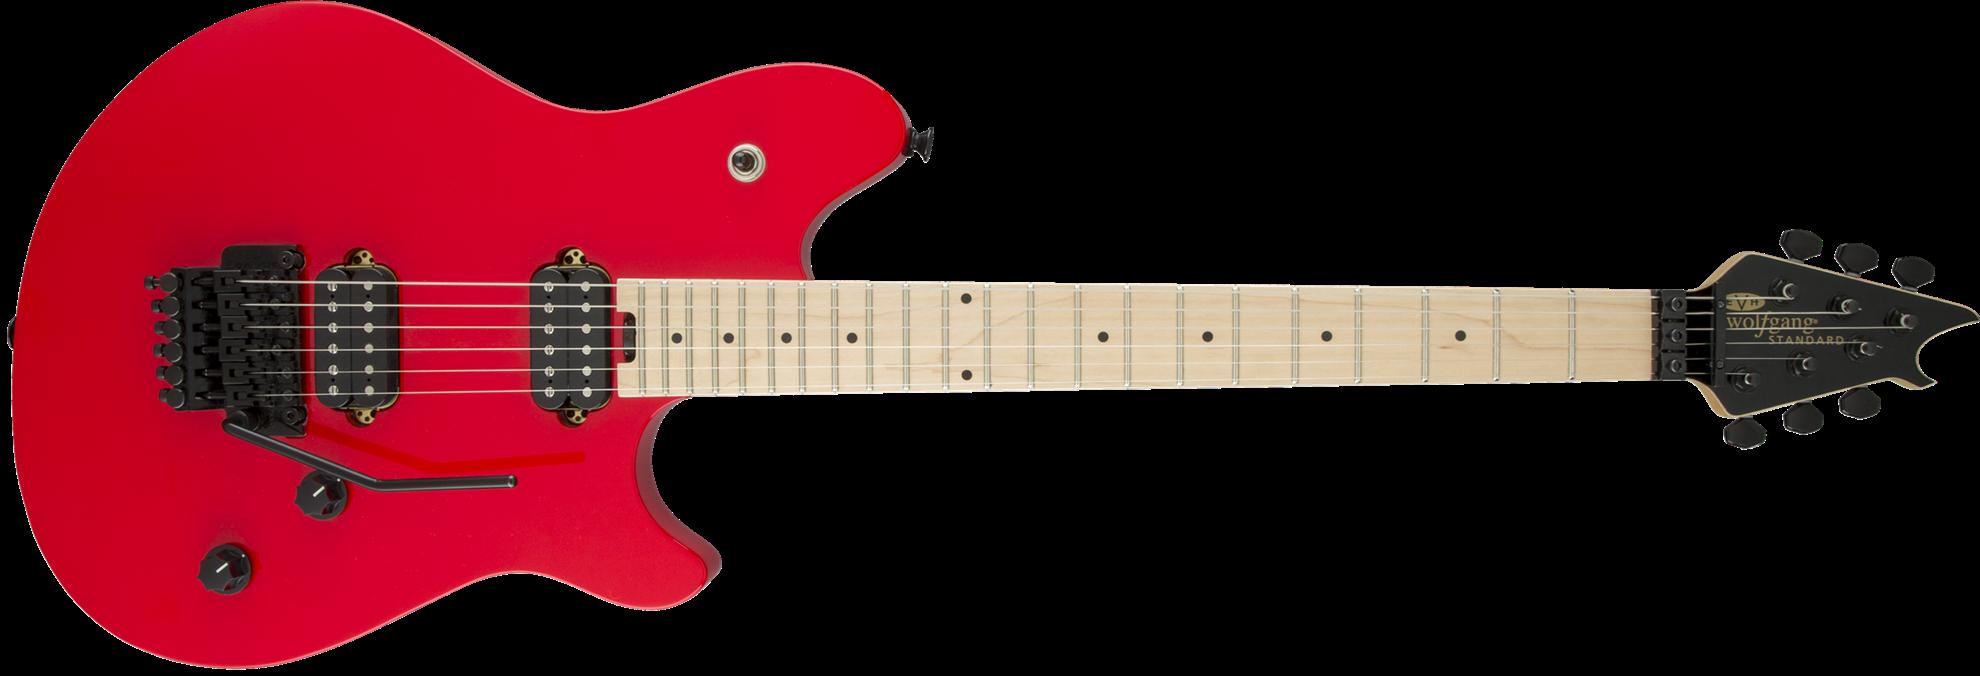 evh wolfgang standard hh floyd rose maple neck electric guitar ferrari red perth mega music. Black Bedroom Furniture Sets. Home Design Ideas